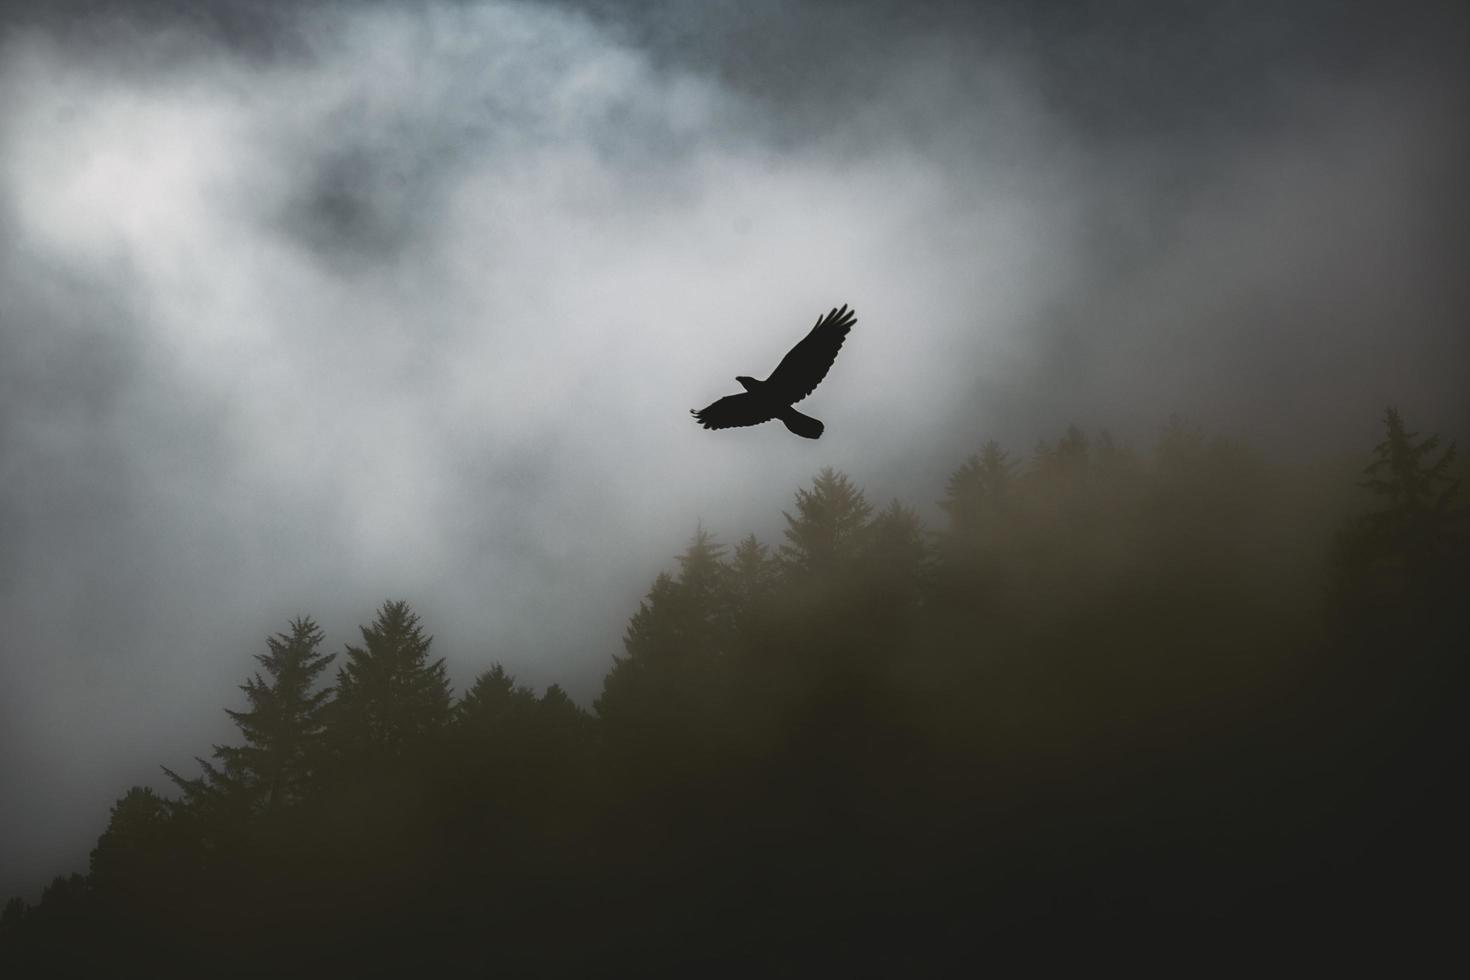 pájaro volando sobre paisaje brumoso foto